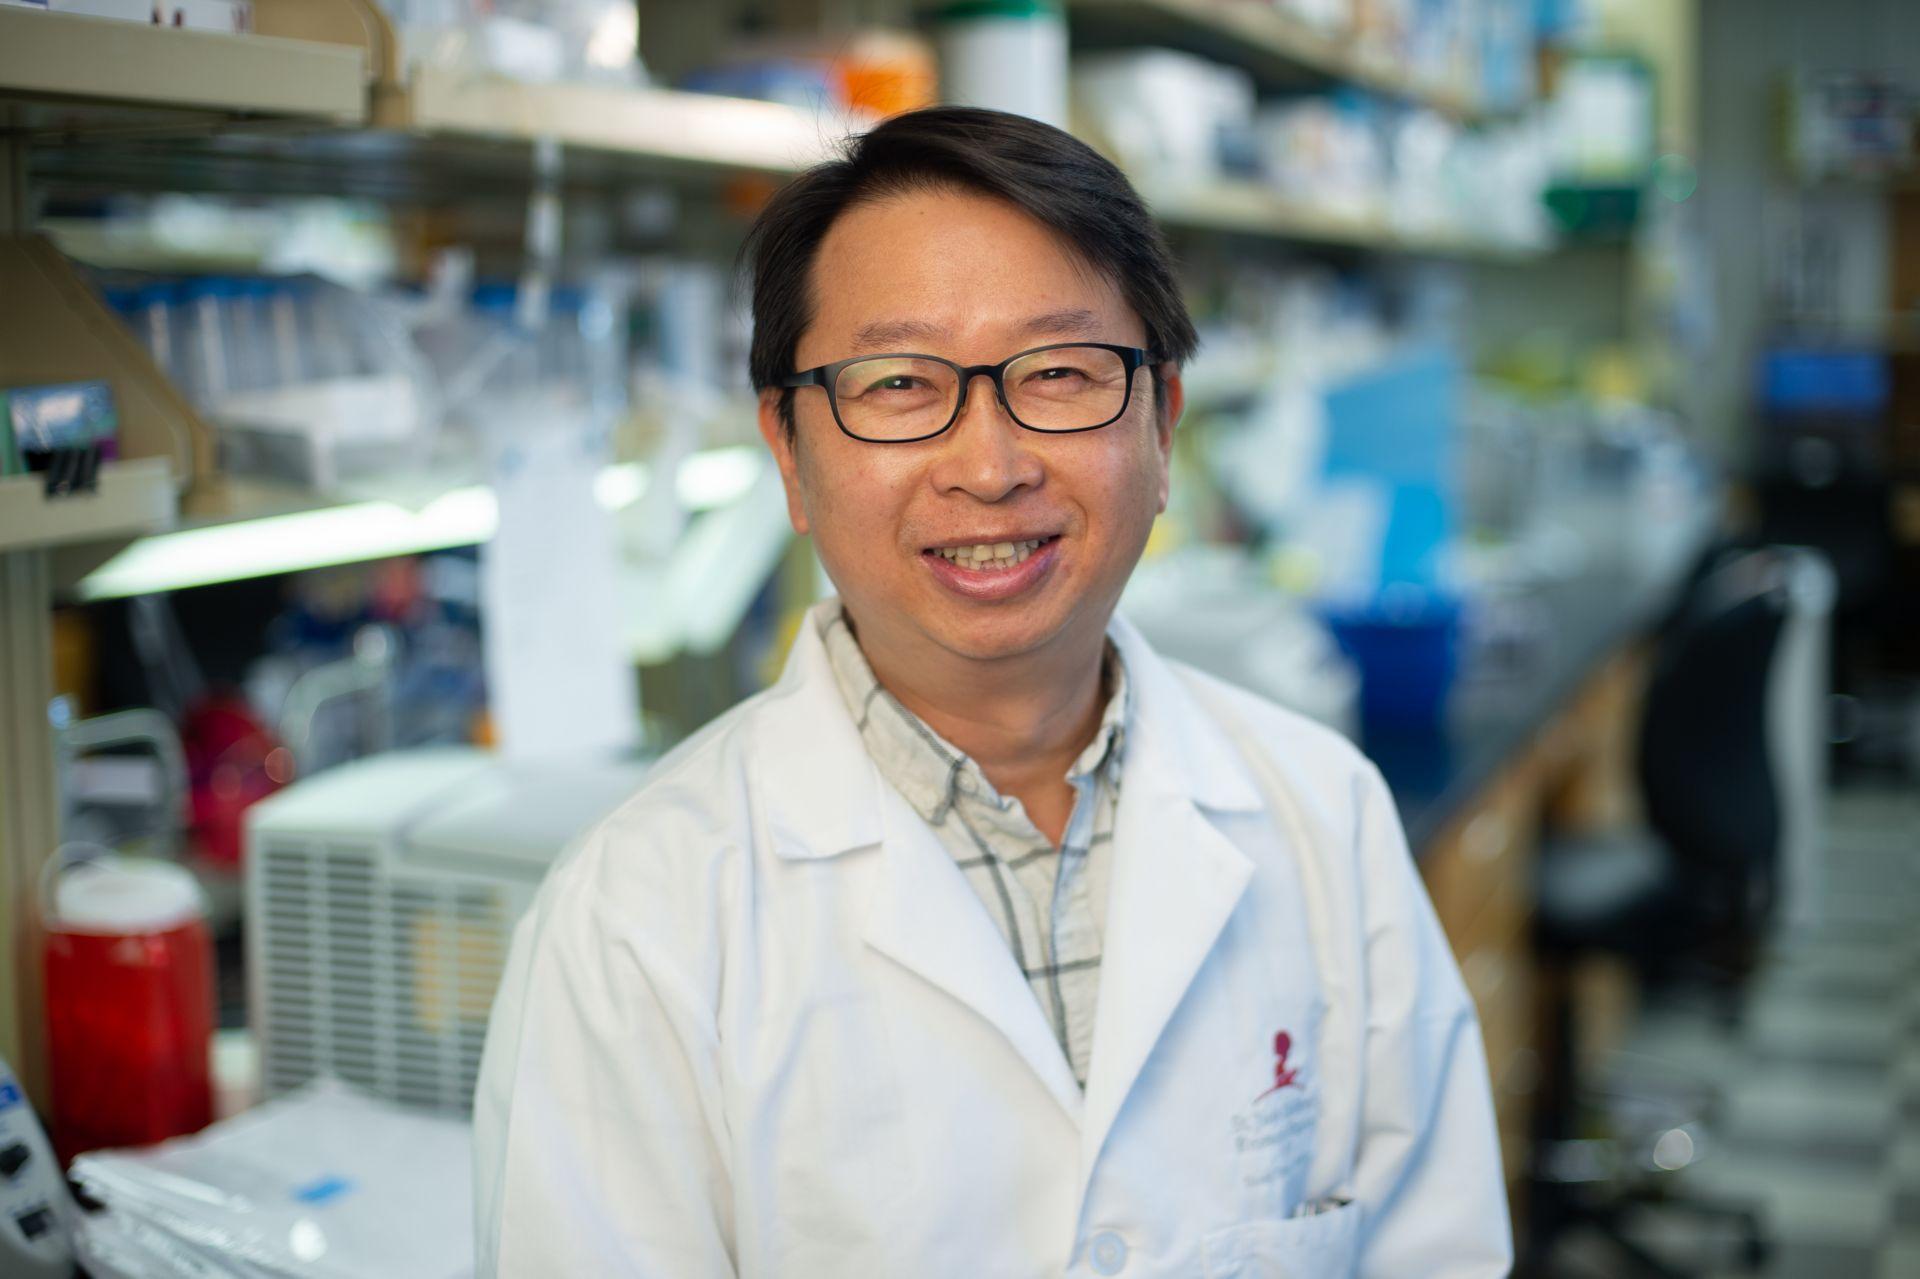 Joung Hyuck Joo, PhD